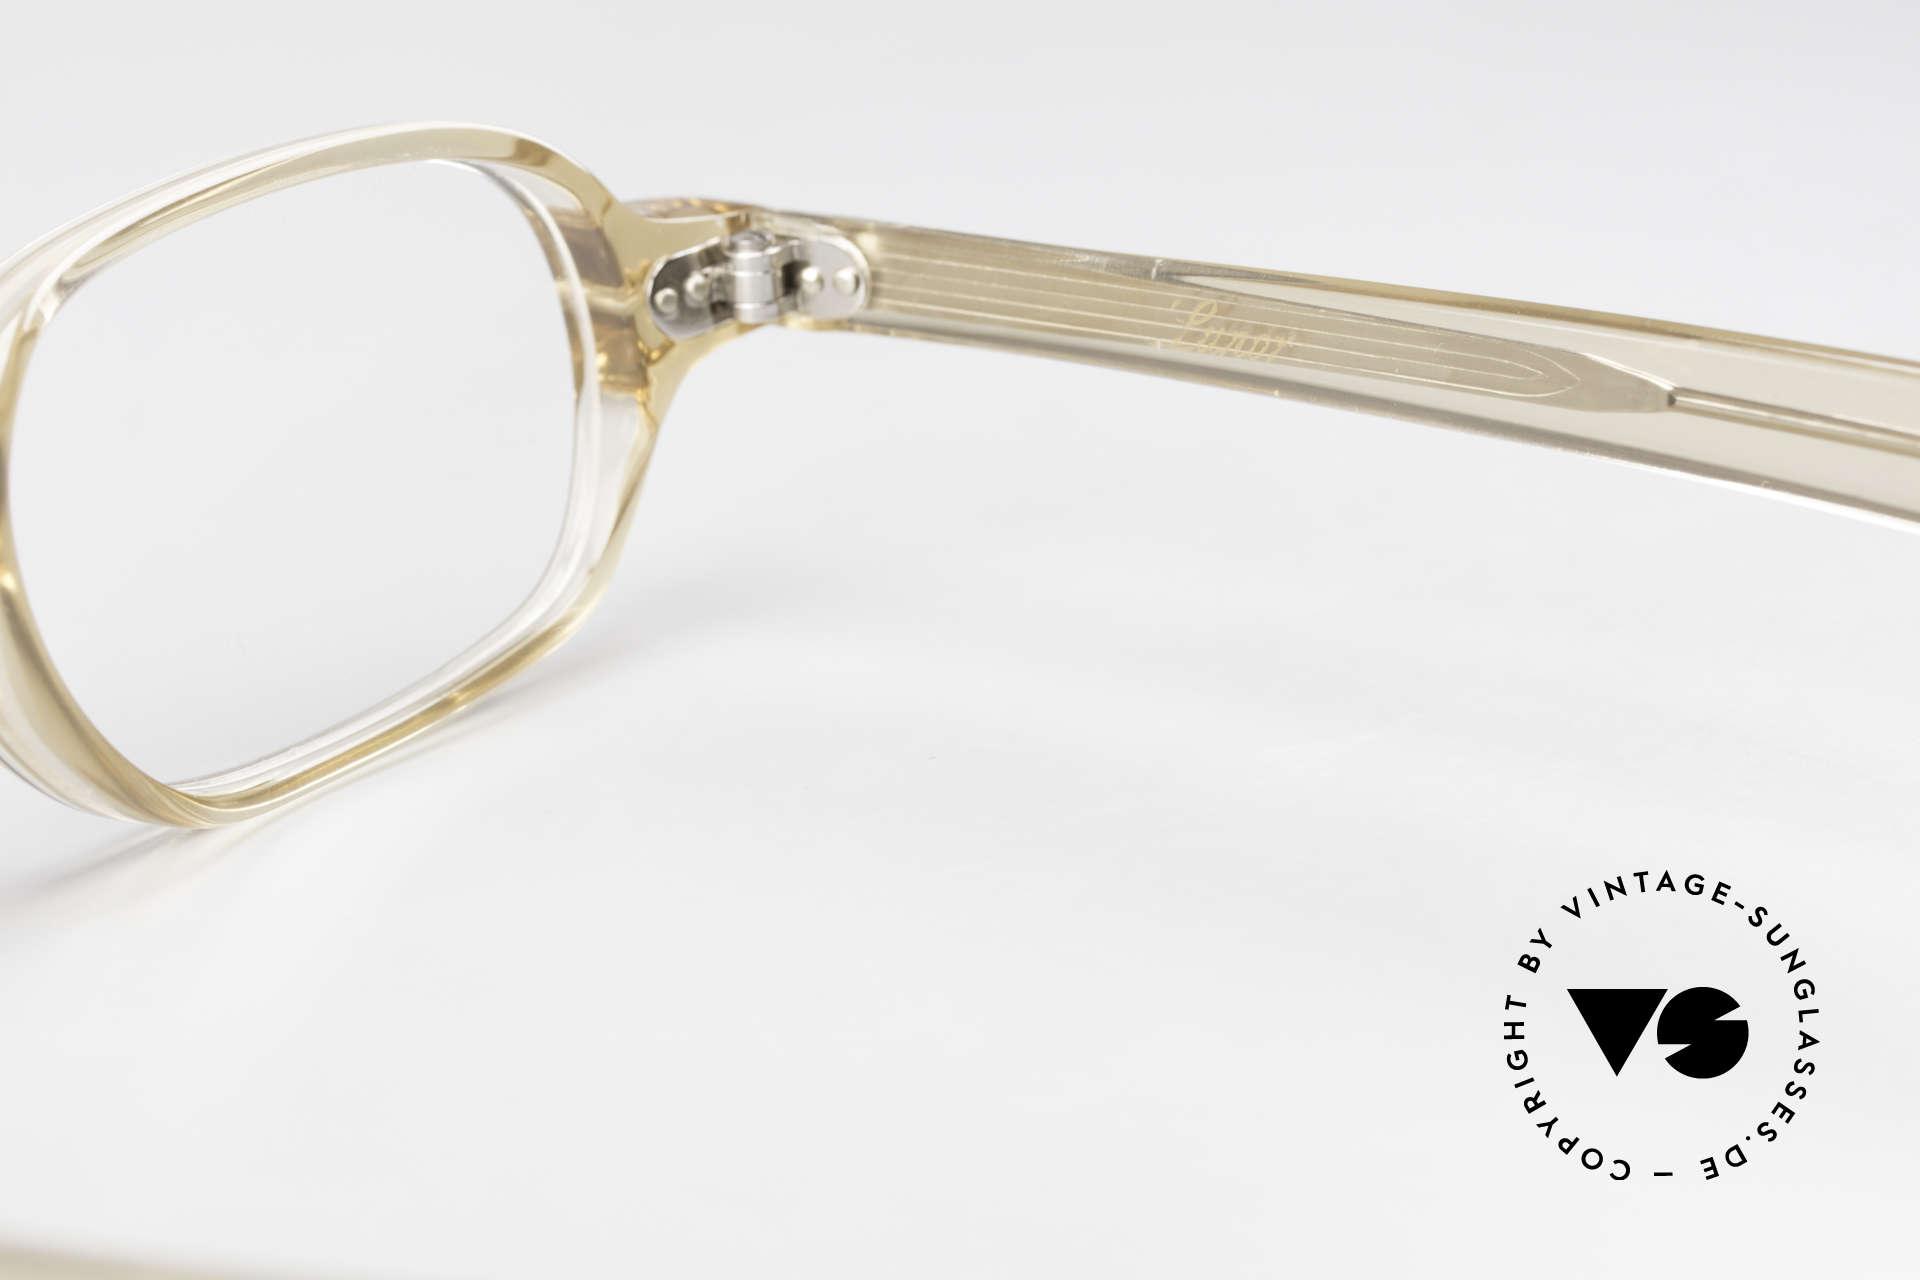 Lunor A56 Classic Lunor Acetate Glasses, Size: medium, Made for Men and Women